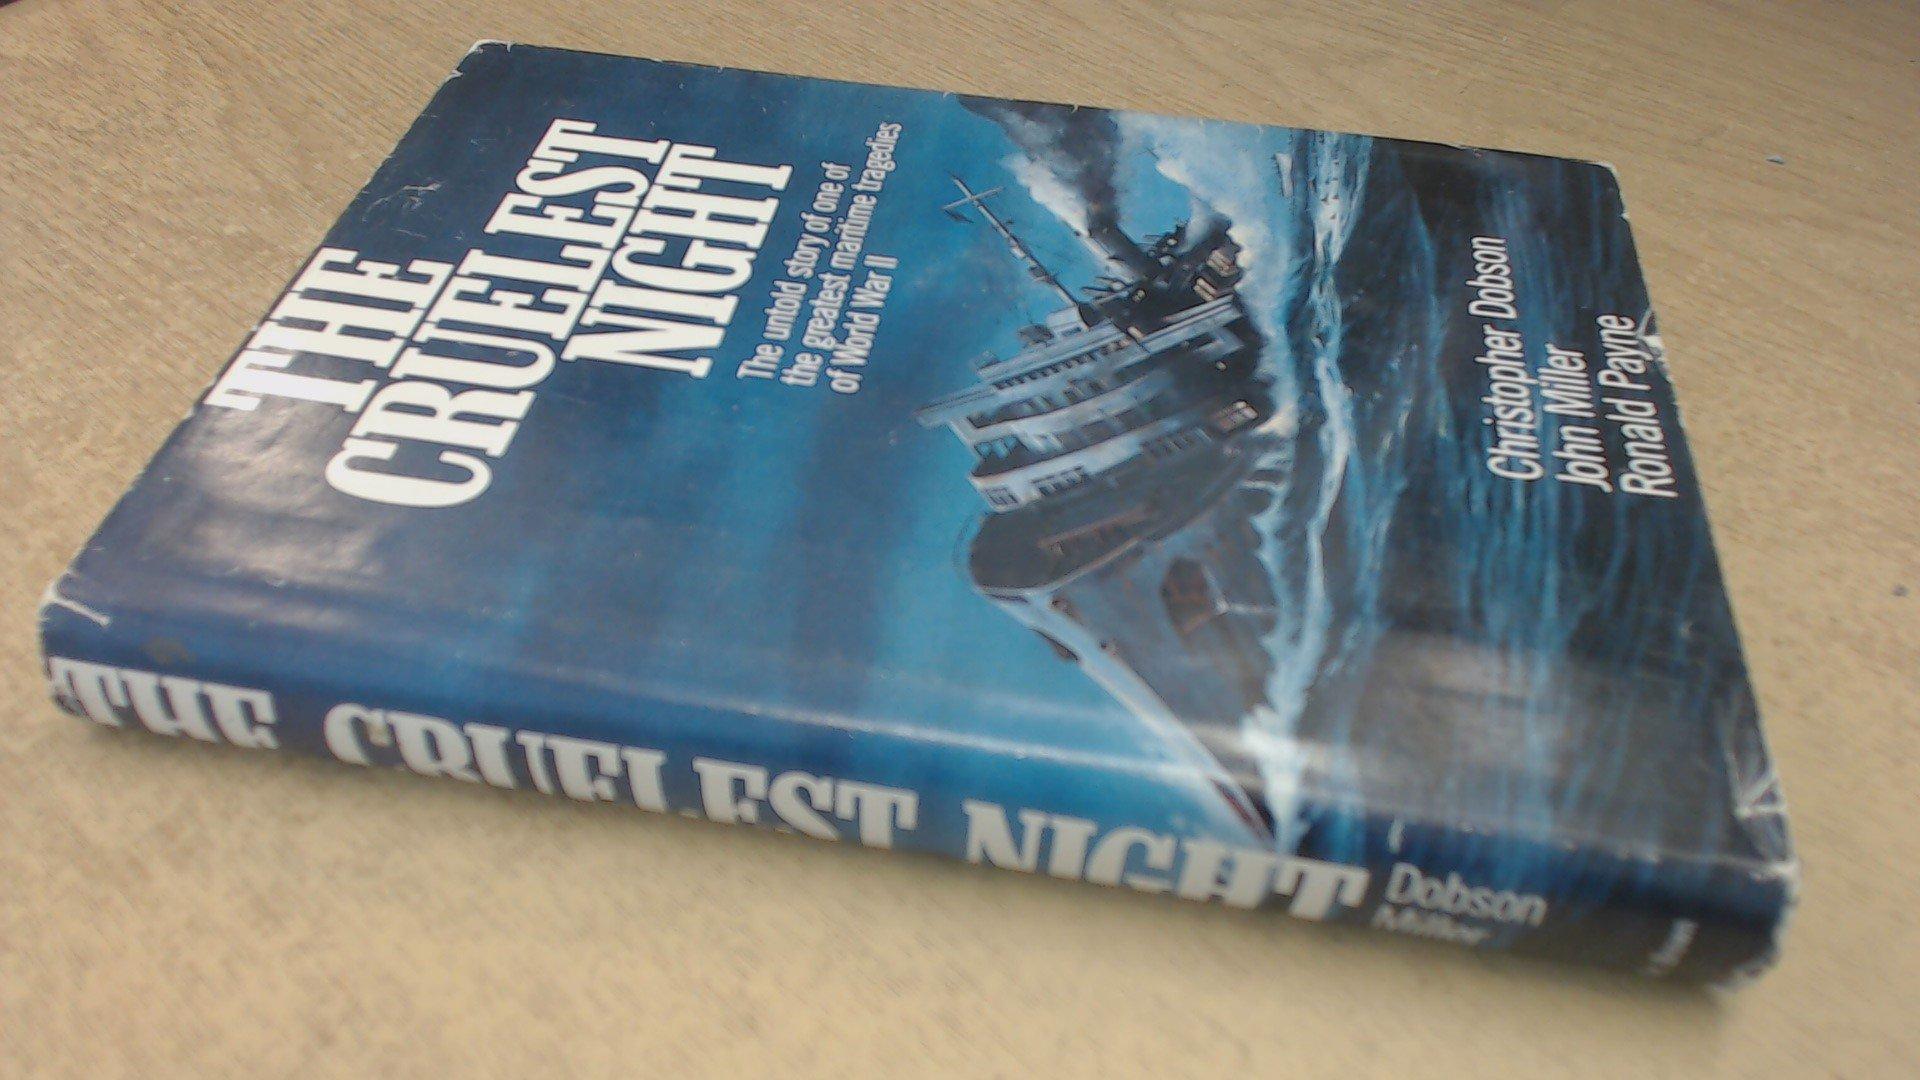 The Cruelest Night: Christopher Dobson: 9780316189200: Amazon: Books